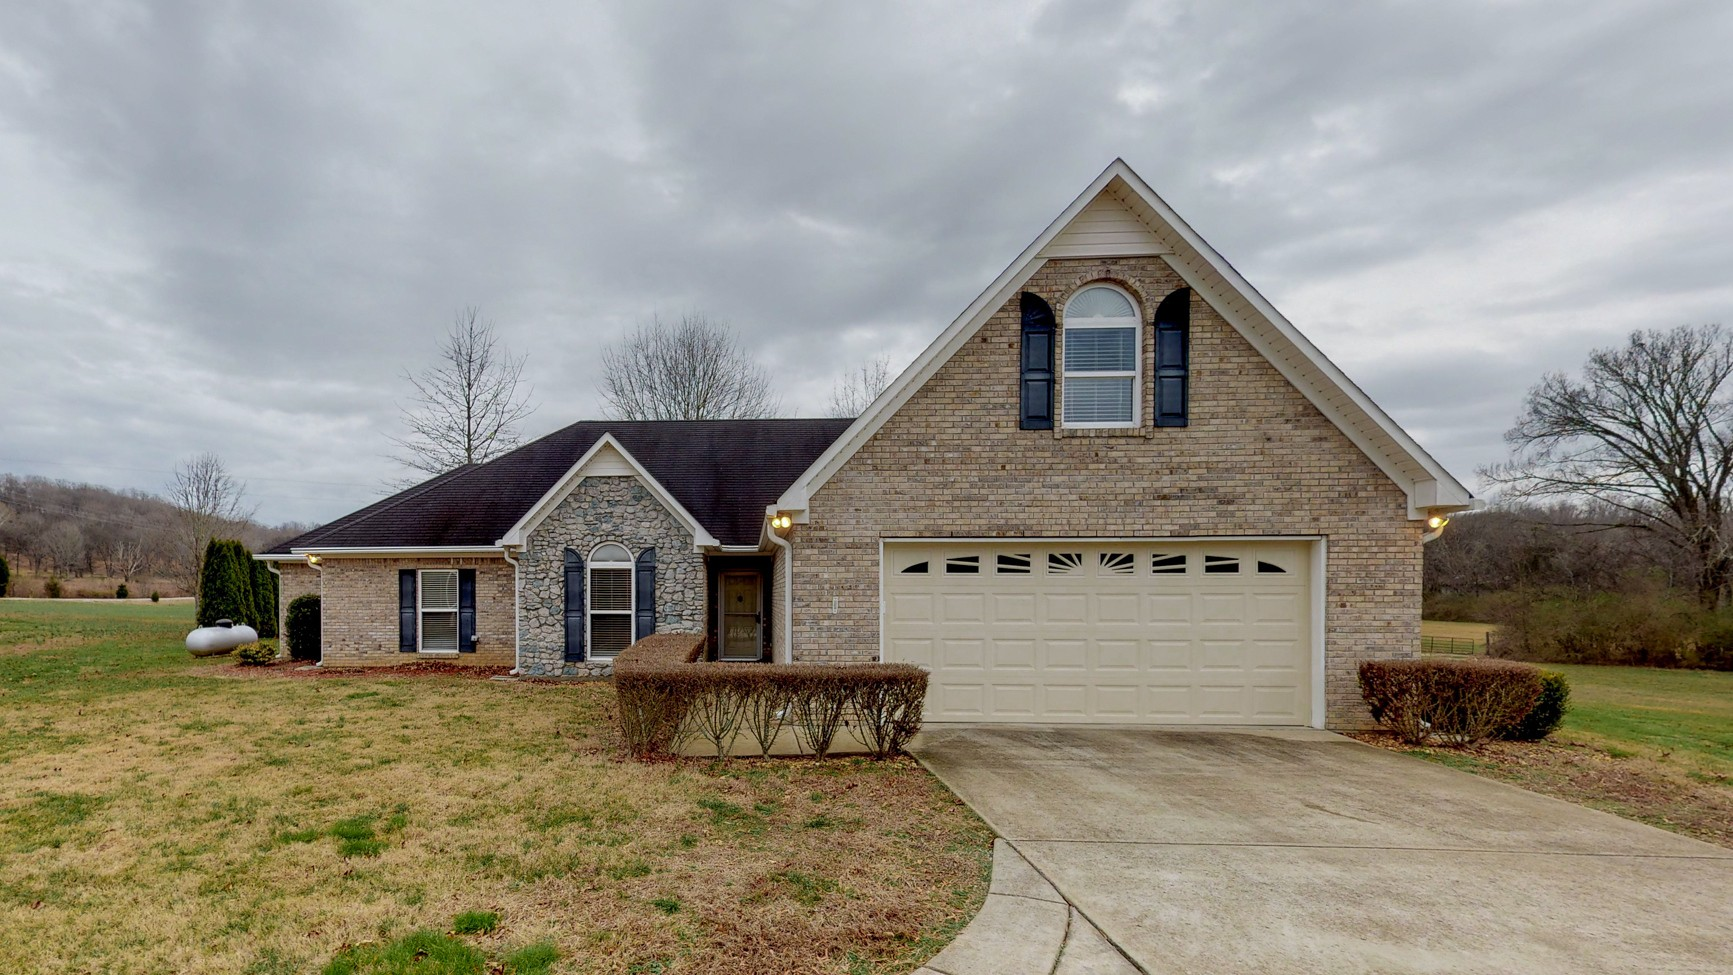 4027 Trousdale Ln, Columbia, TN 38401 - Columbia, TN real estate listing